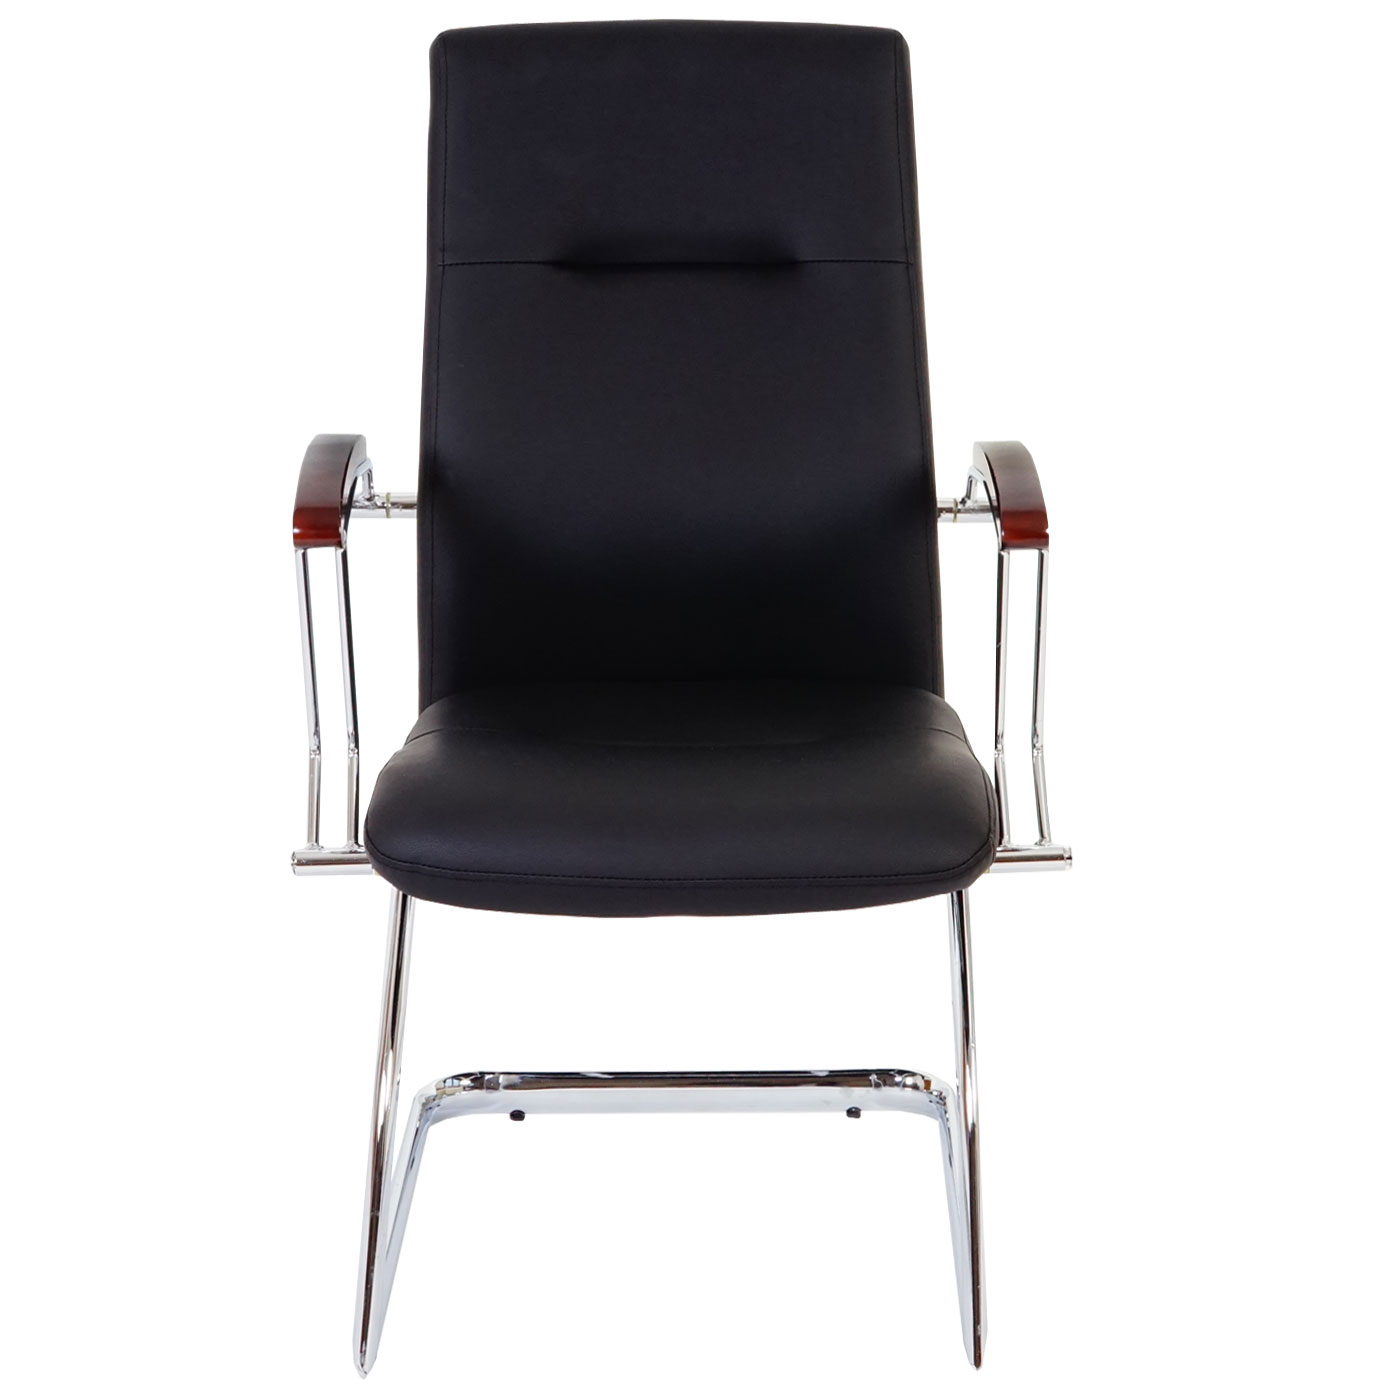 Set 2x sedie ufficio a slitta cesena ecopelle 70x57x95cm for Sedie ufficio genova